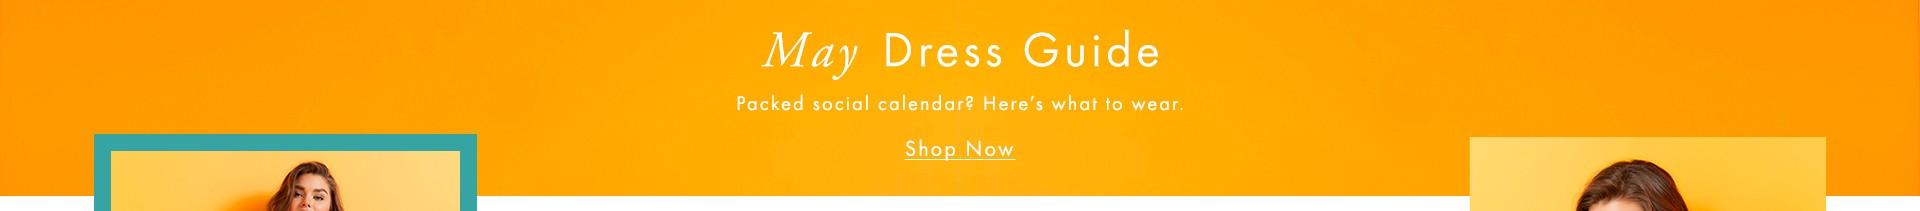 May Dress Guide